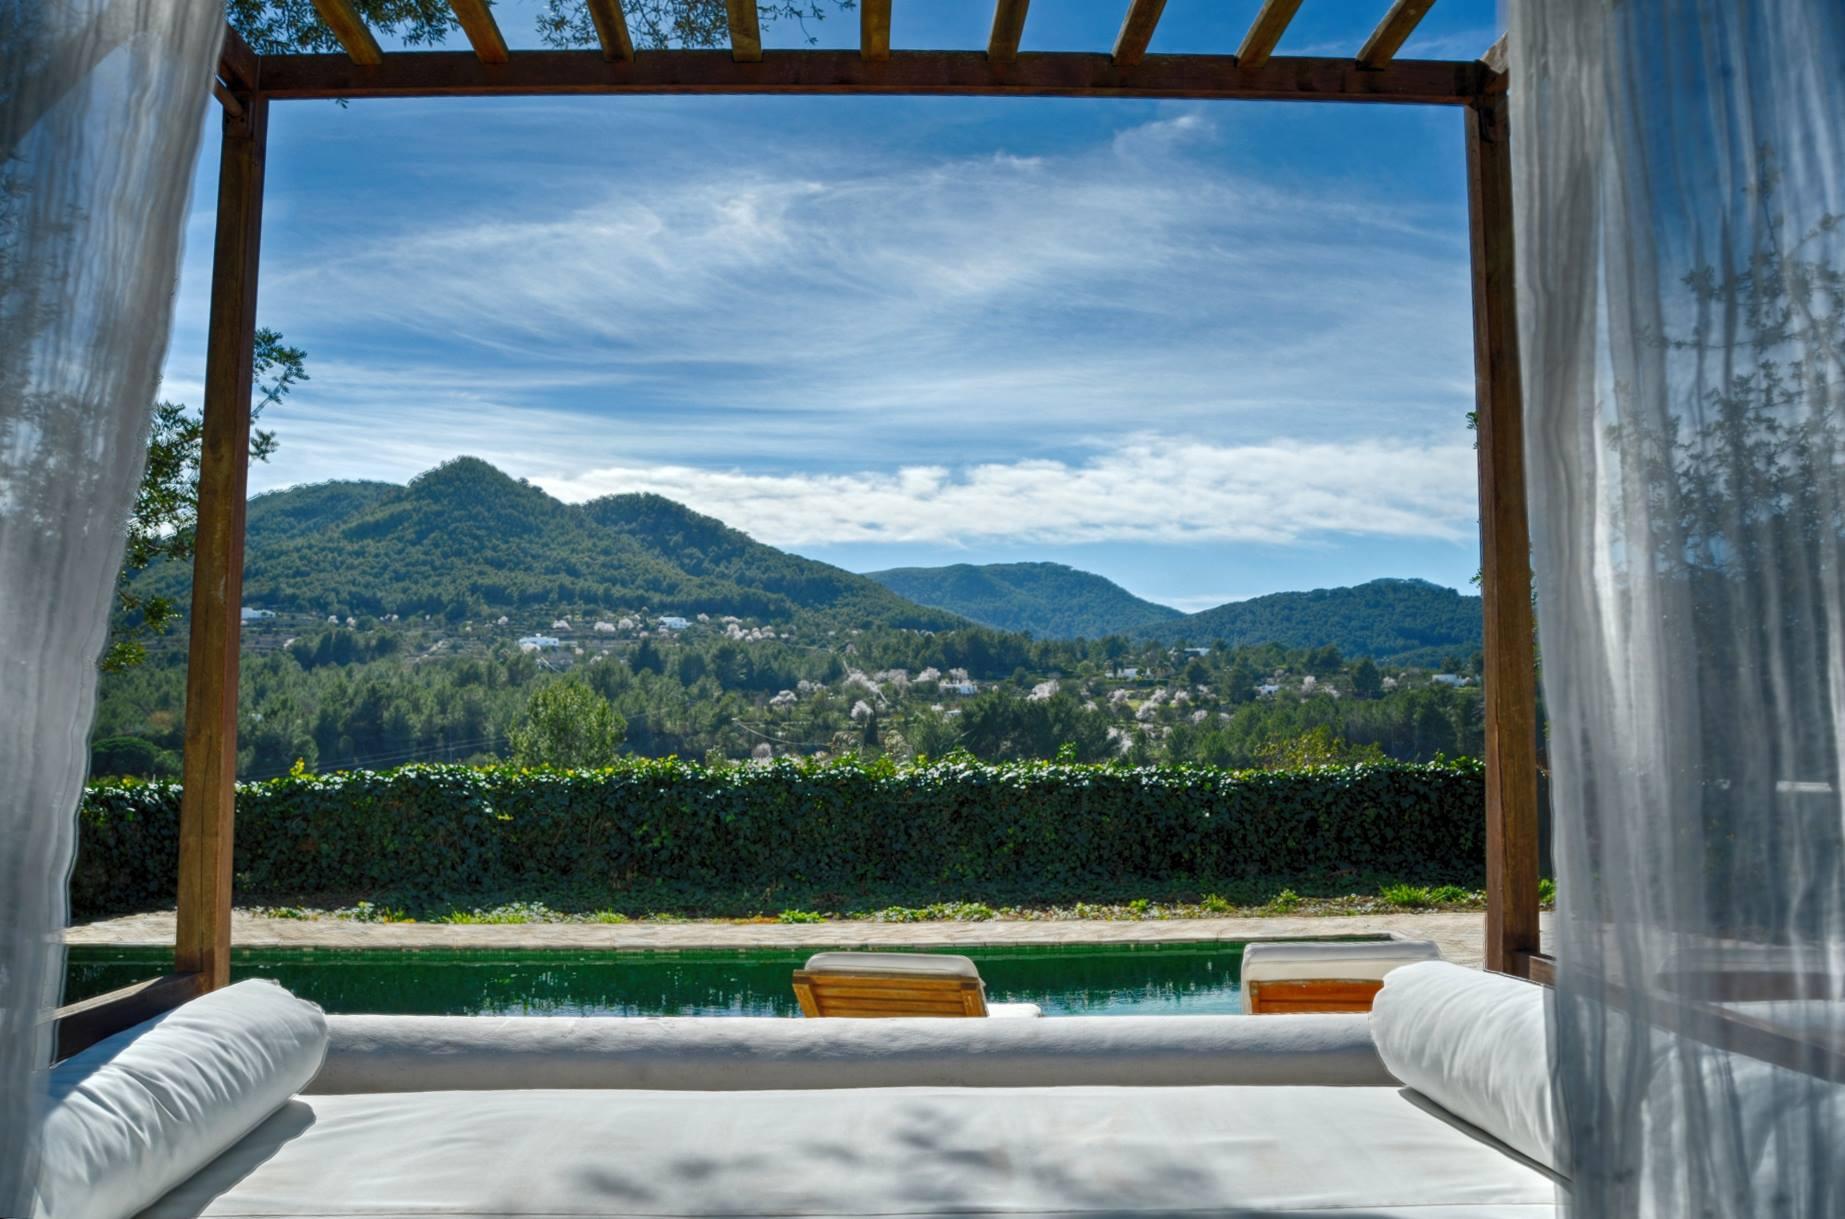 Yogaschule Hannover - Yoga Retreat Ibiza - Ausblick Berge